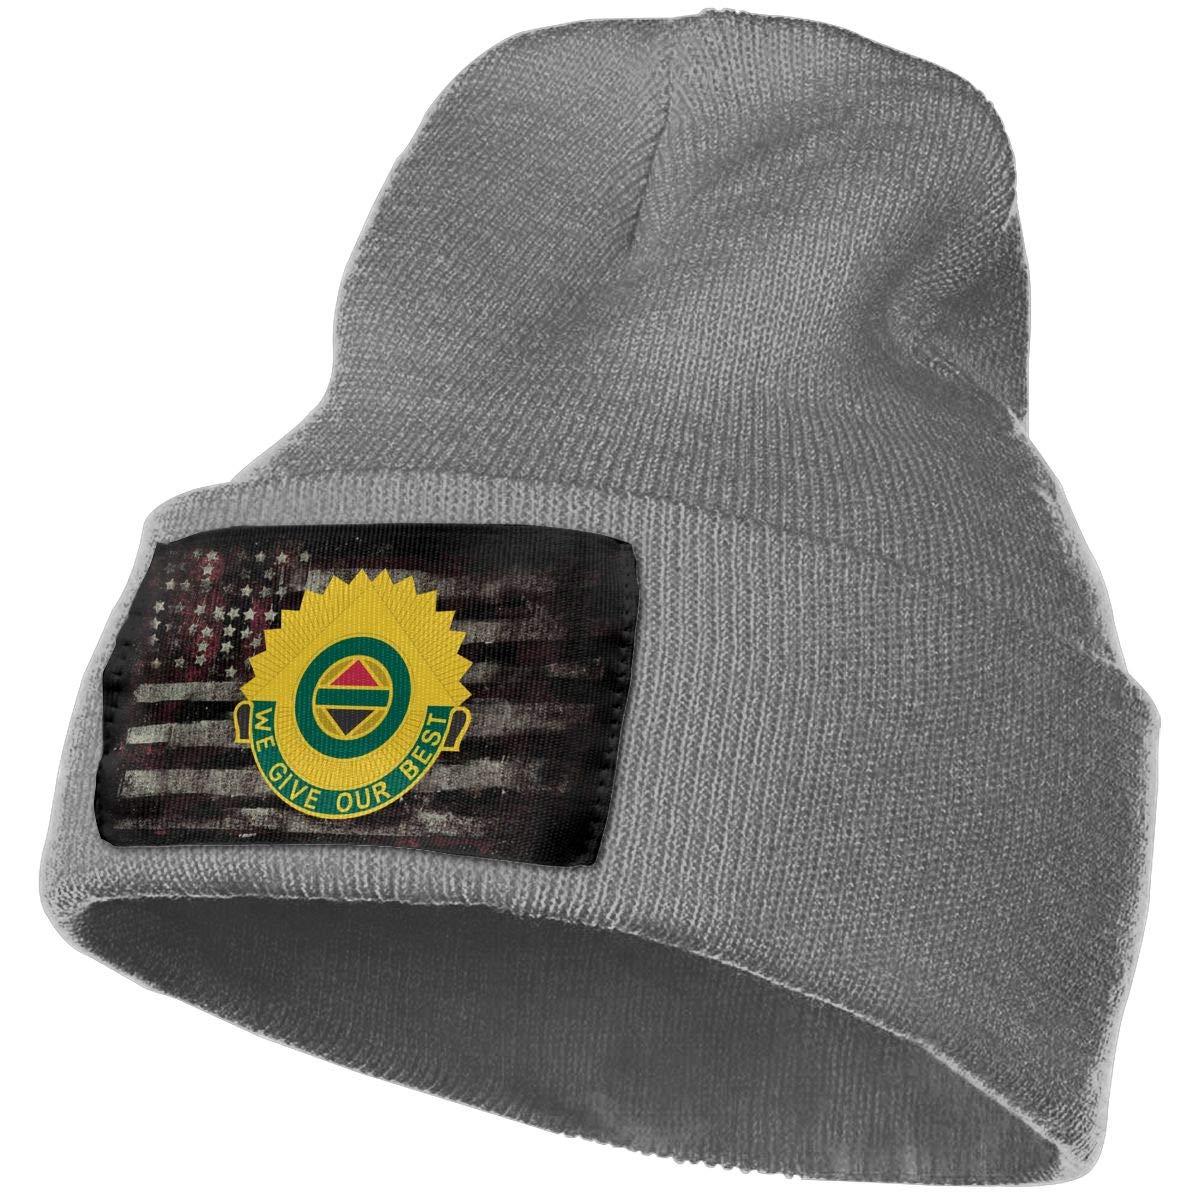 Army 14th Military Police Brigade Unit Crest Mens Beanie Cap Skull Cap Winter Warm Knitting Hats.